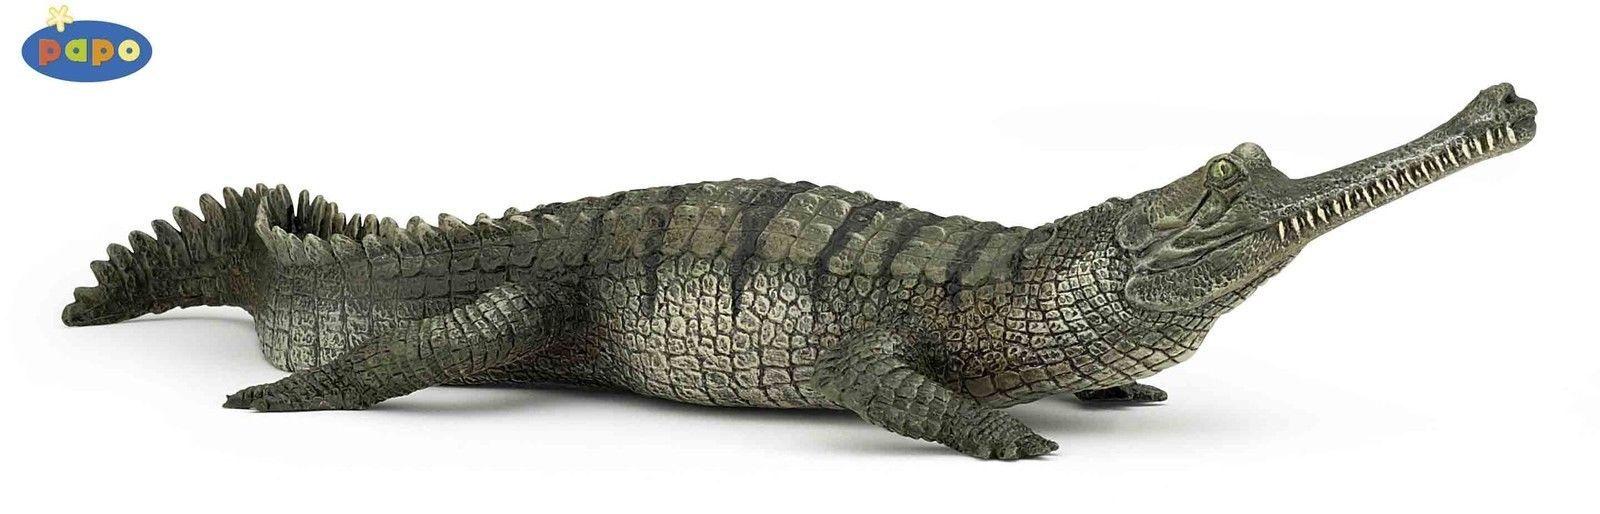 Gavial Crocodile 7 87 034 Papo Wild Animals 50154 Tiere Katzen